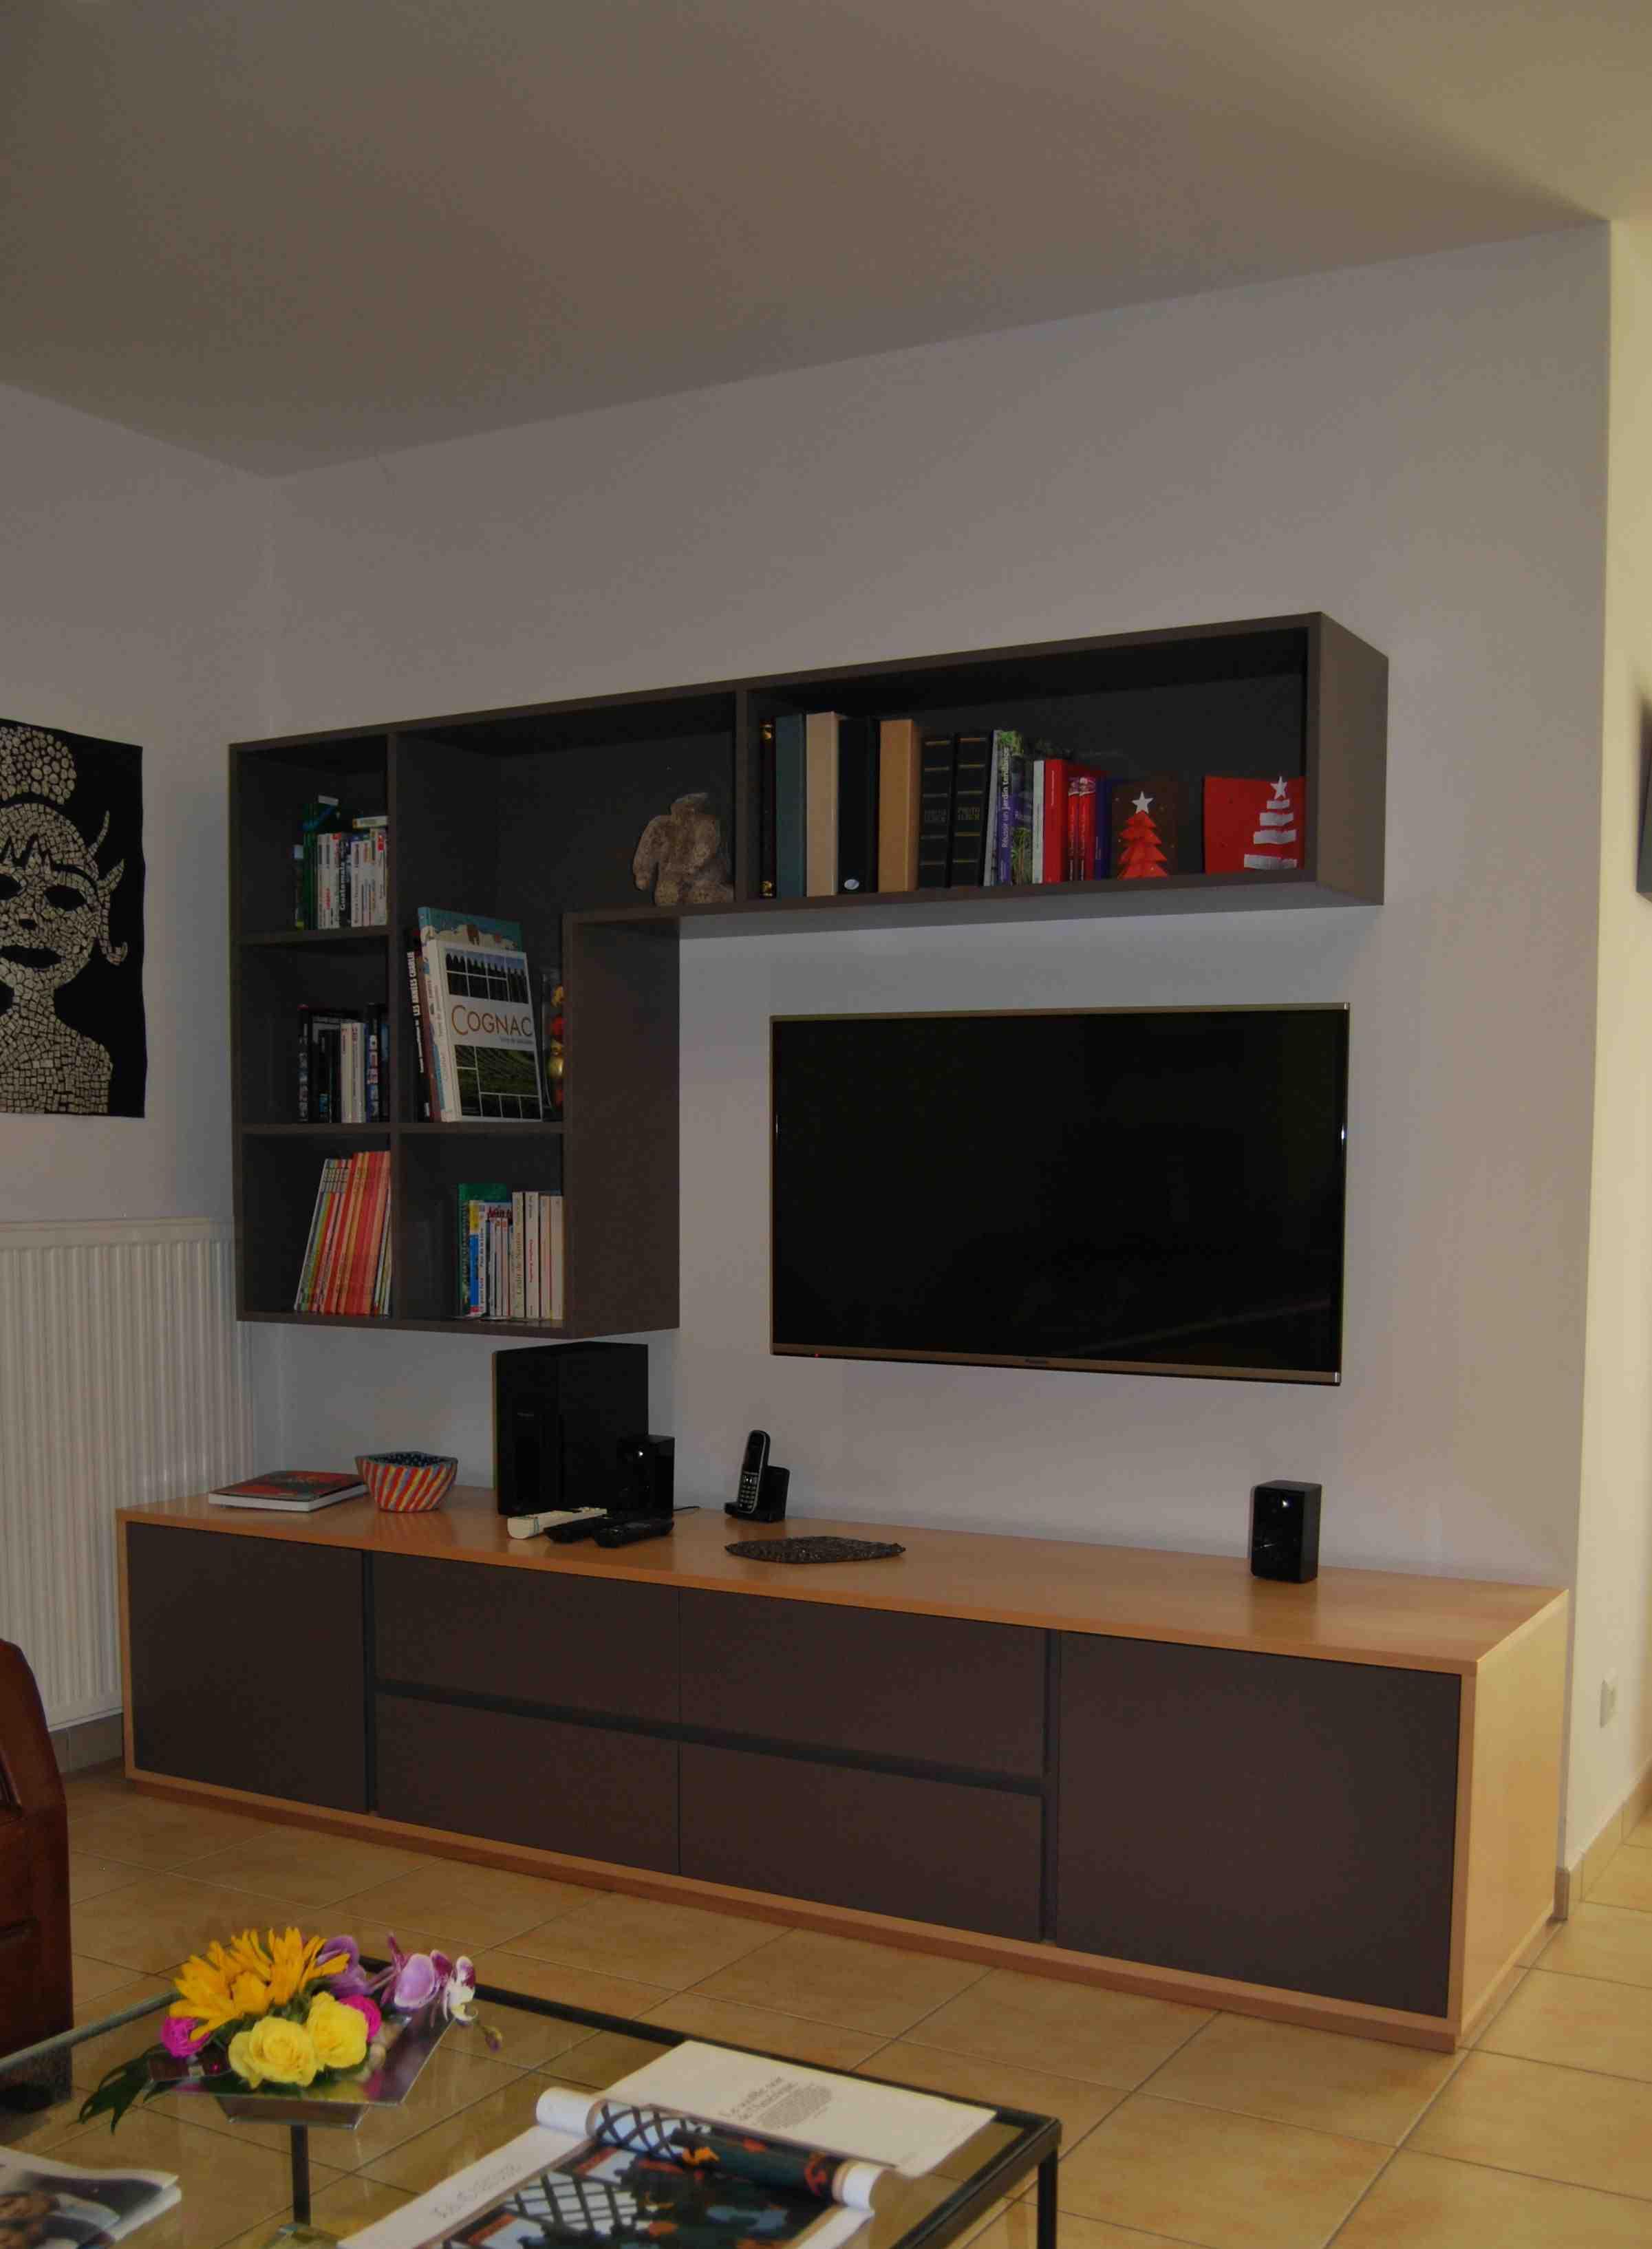 agencement int rieur menuisier eb niste en france et situ en vend e. Black Bedroom Furniture Sets. Home Design Ideas